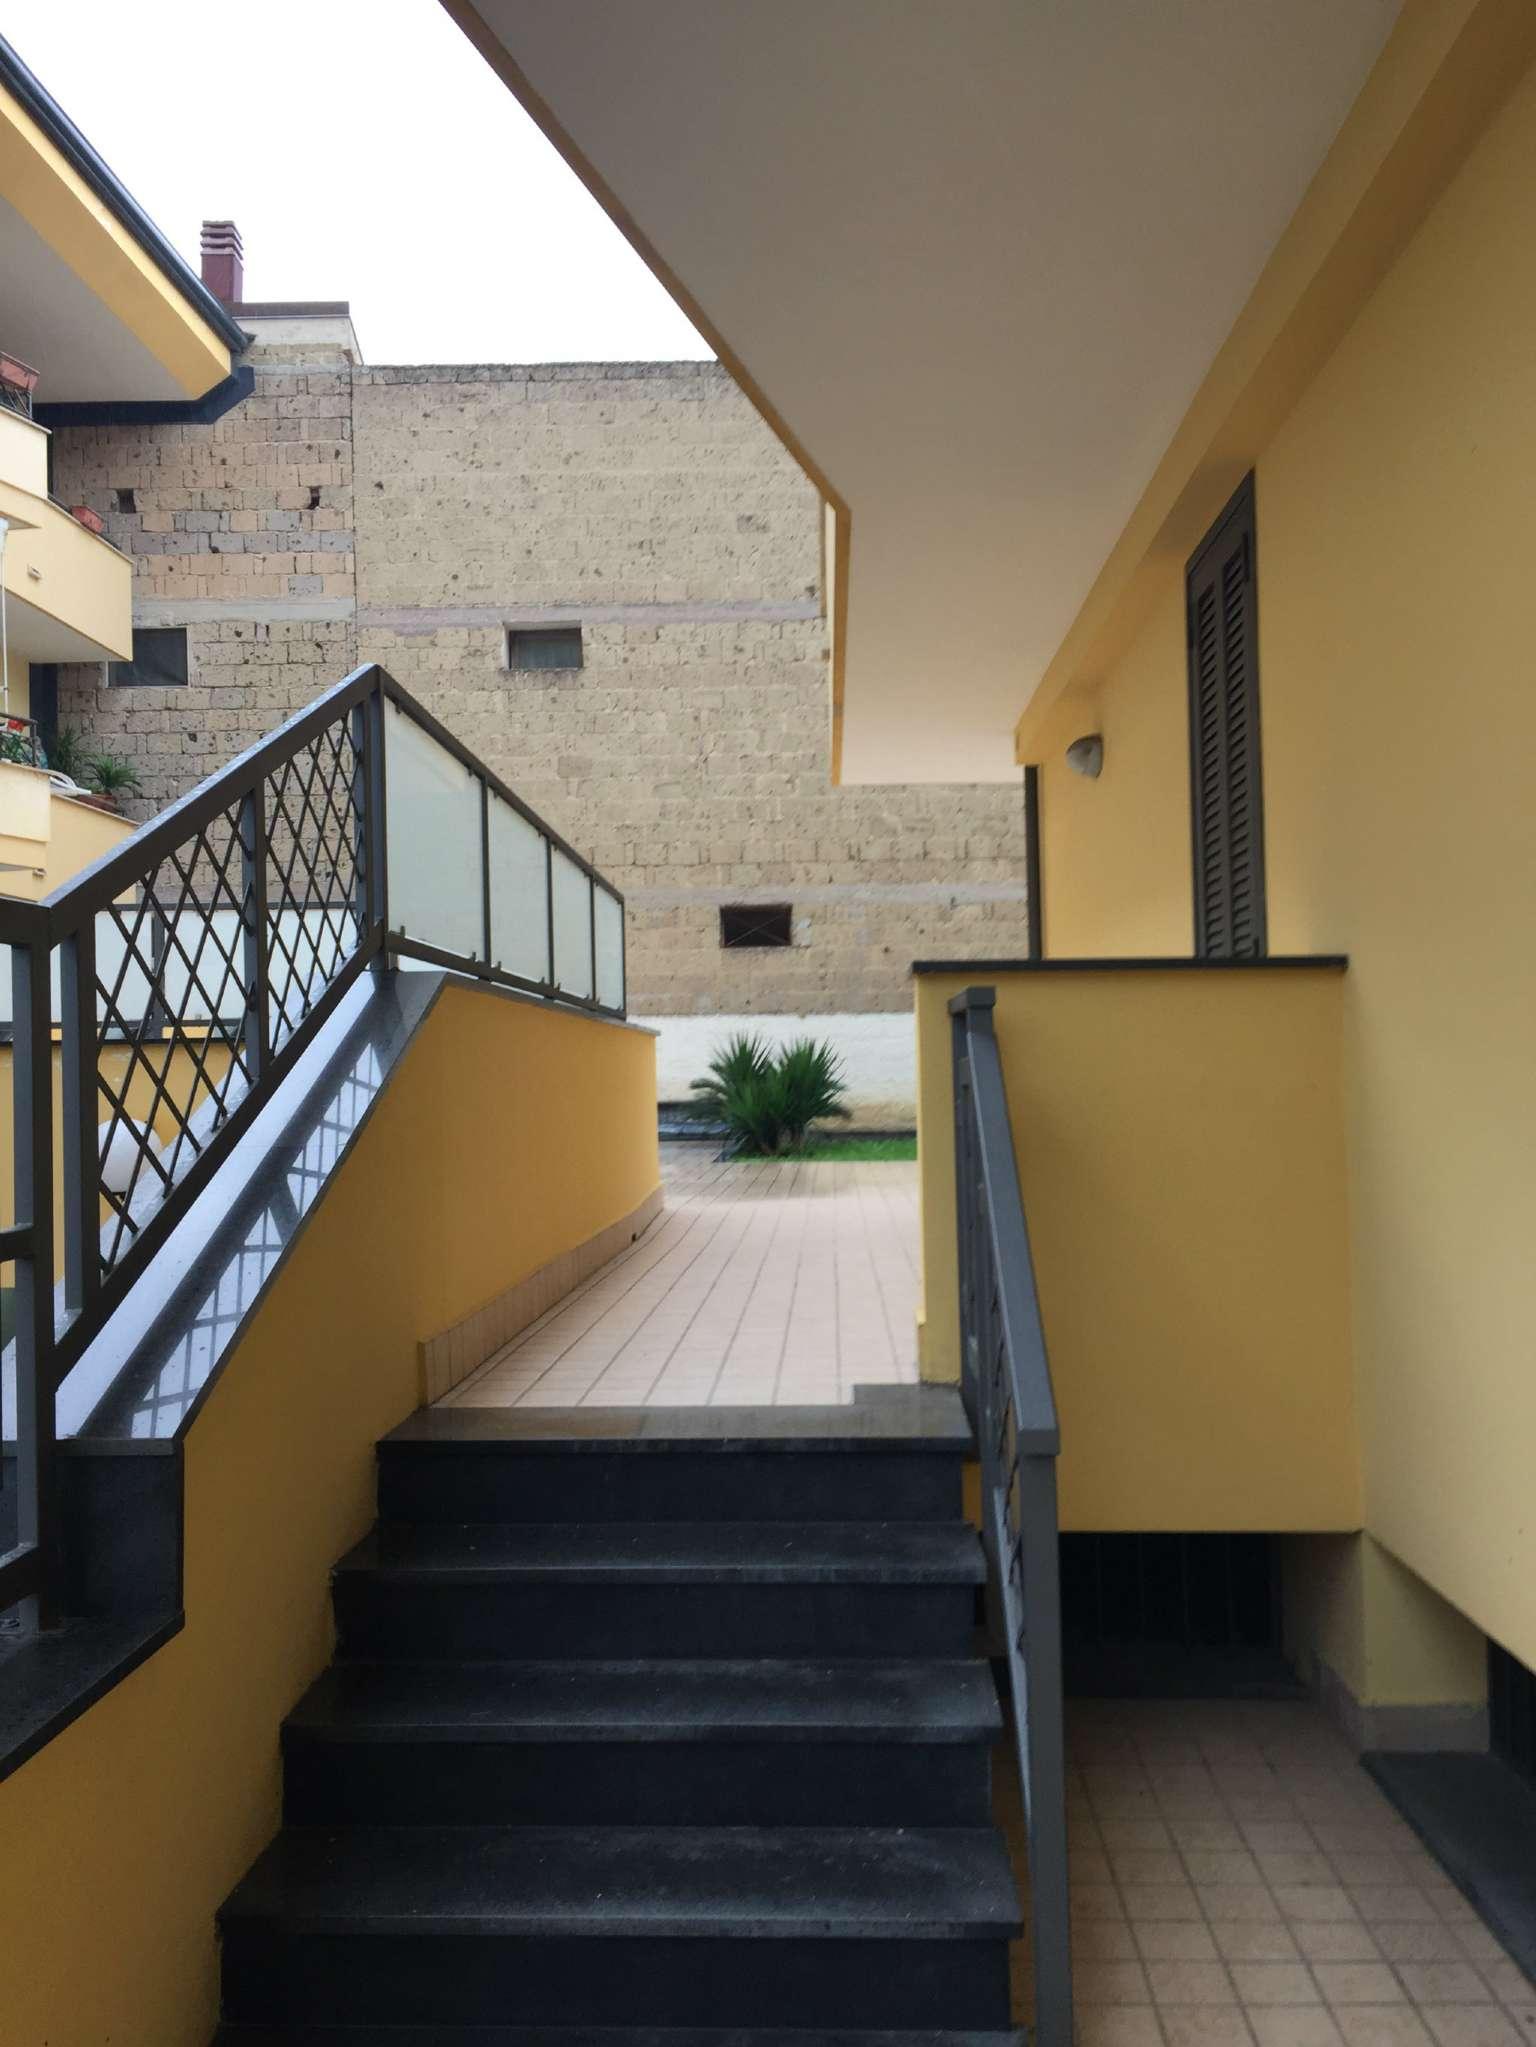 Appartamento Parco Ancar con spazio esclusivo